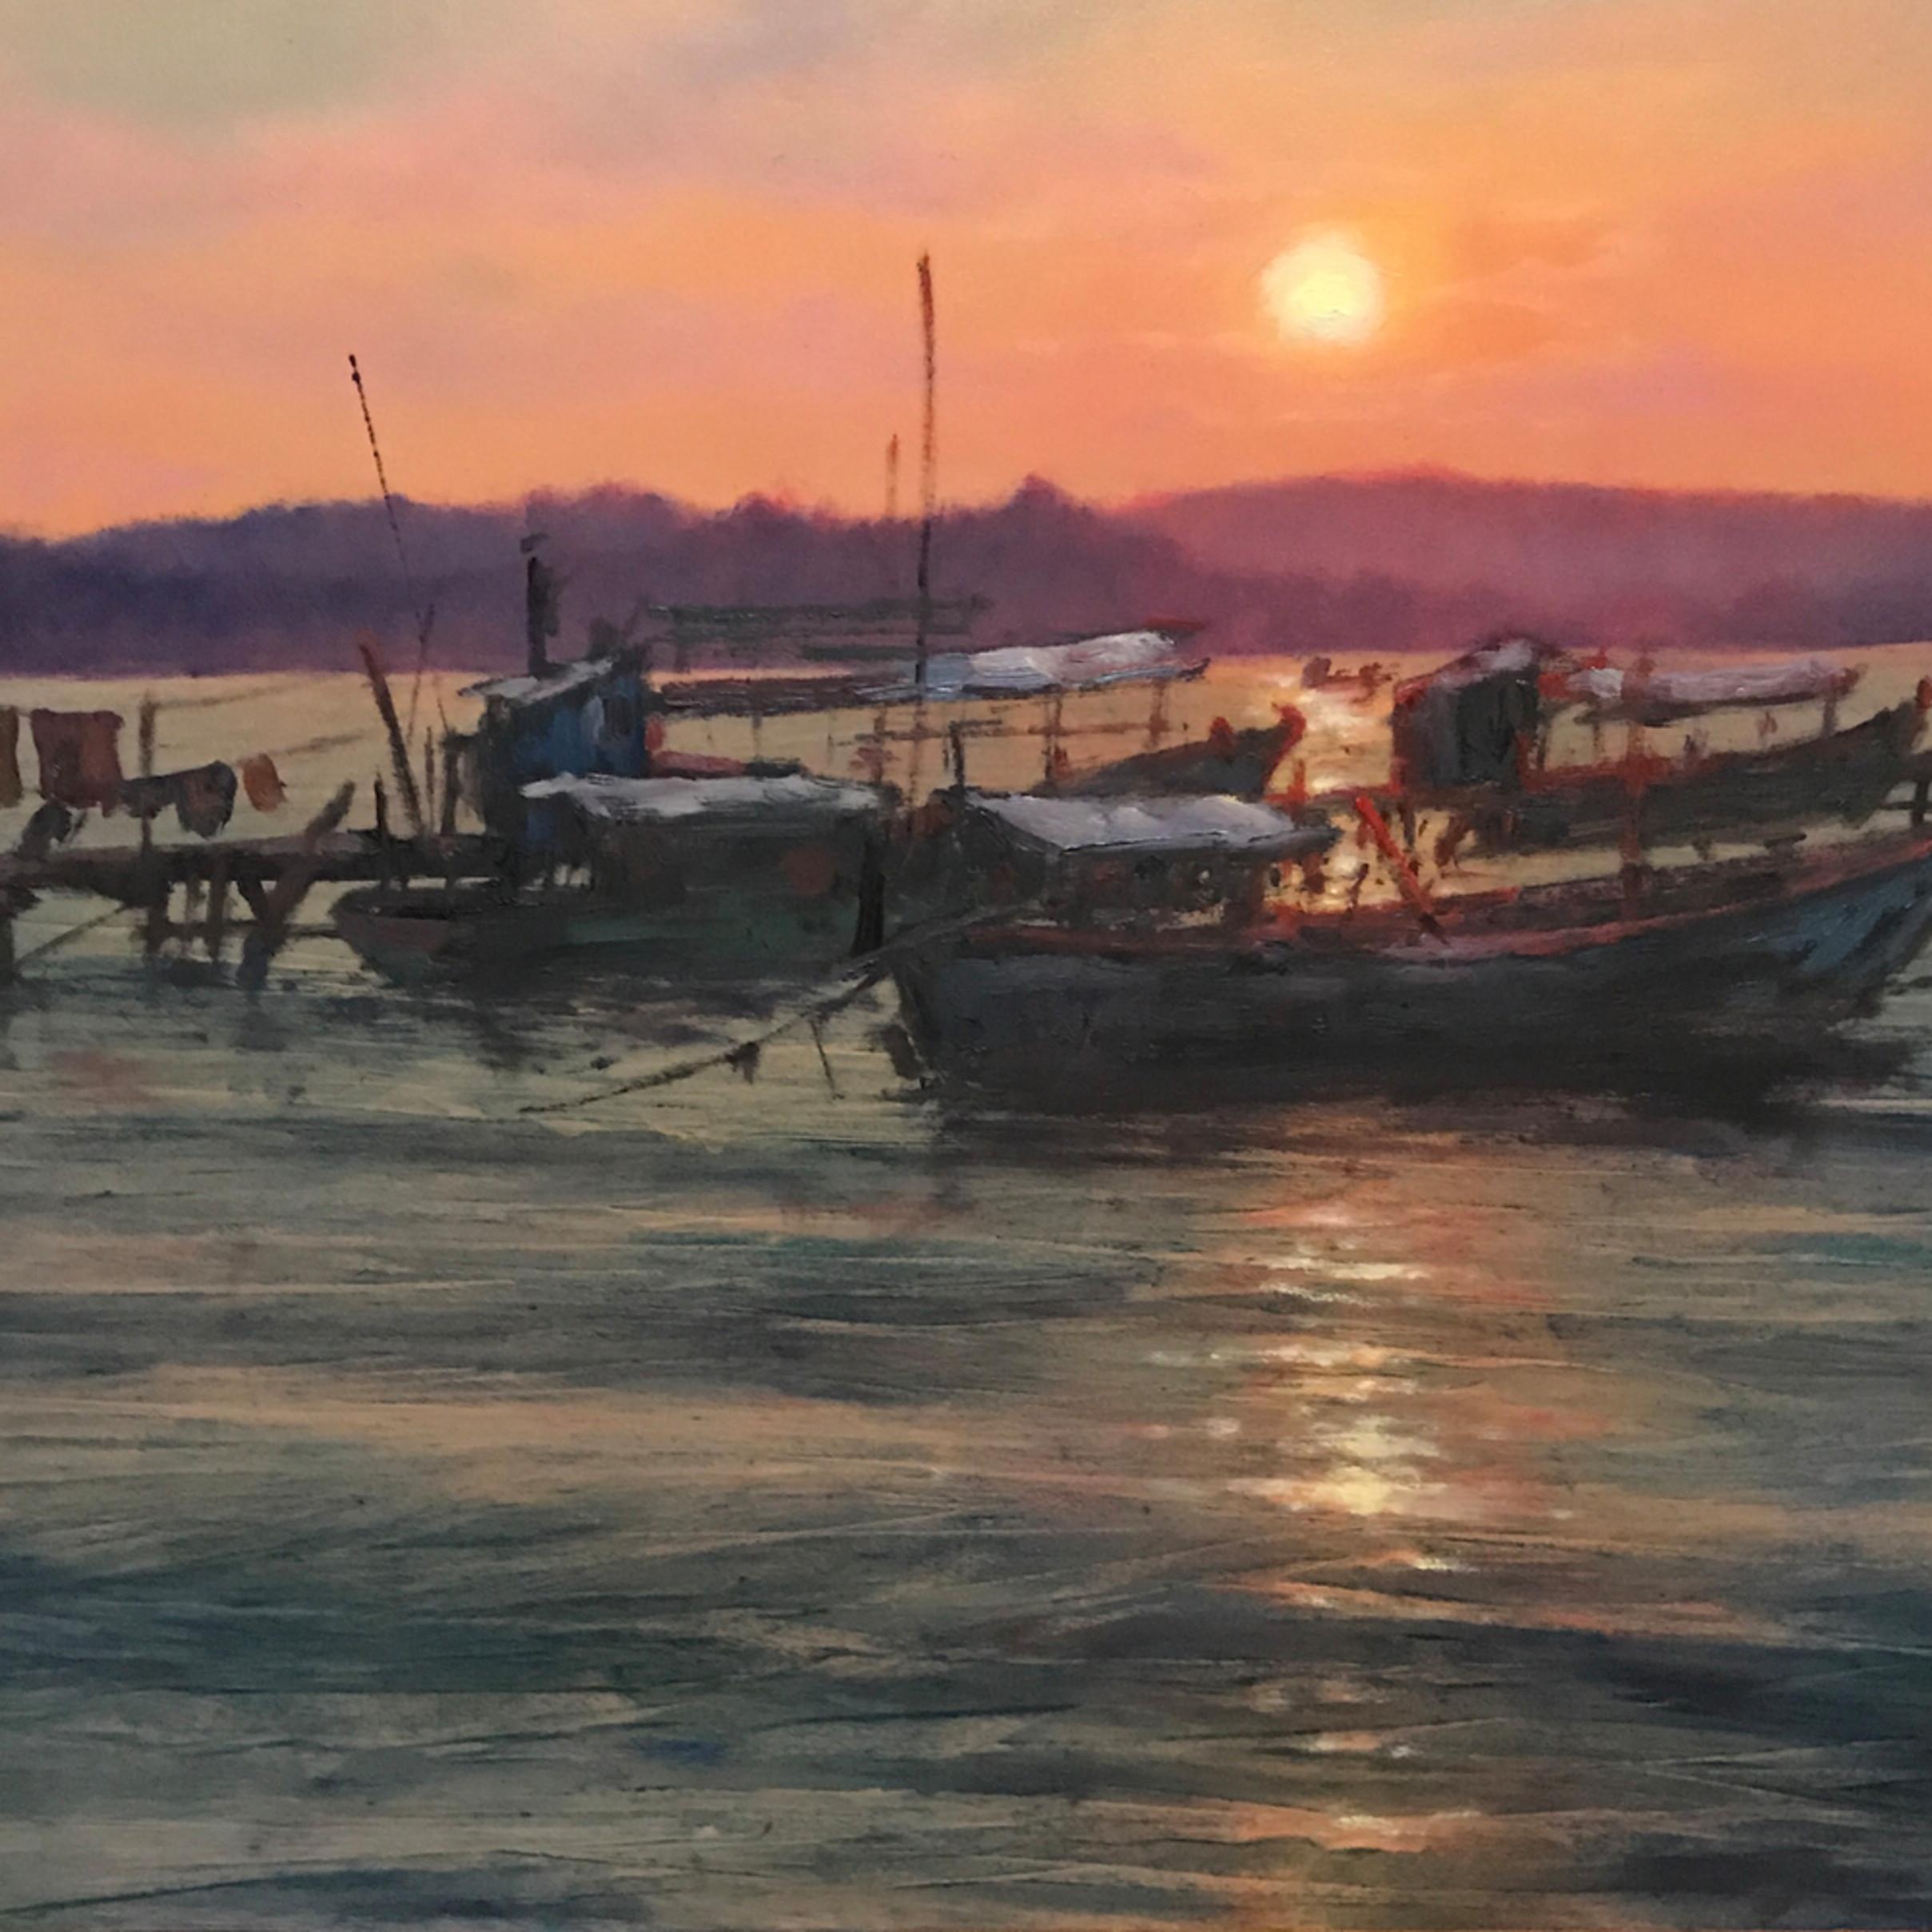 201709 large cambodian boats michaelorwick oils 20x30 uozfgv